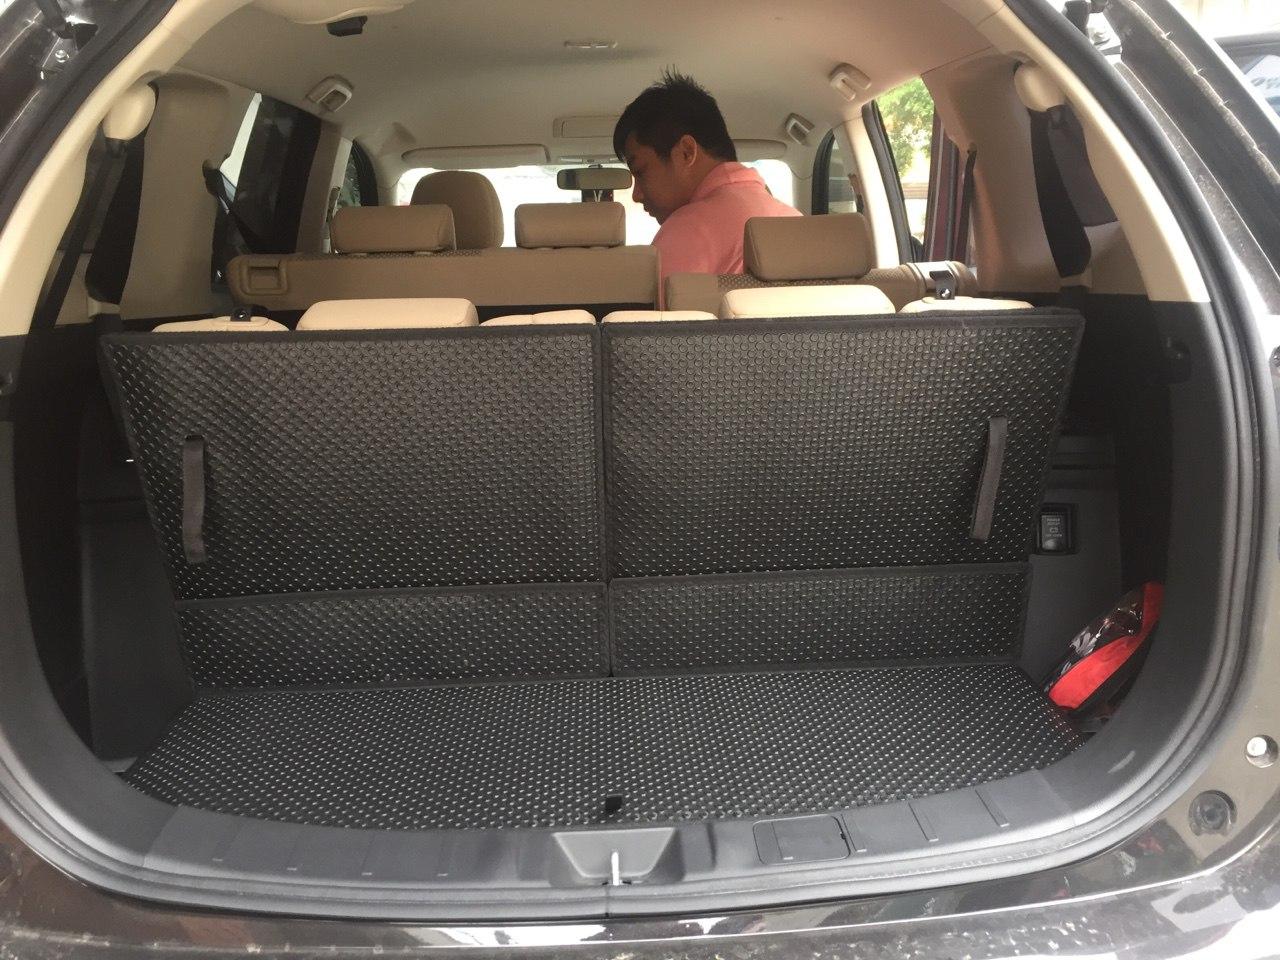 Thảm lót cốp Mitsubishi XPander